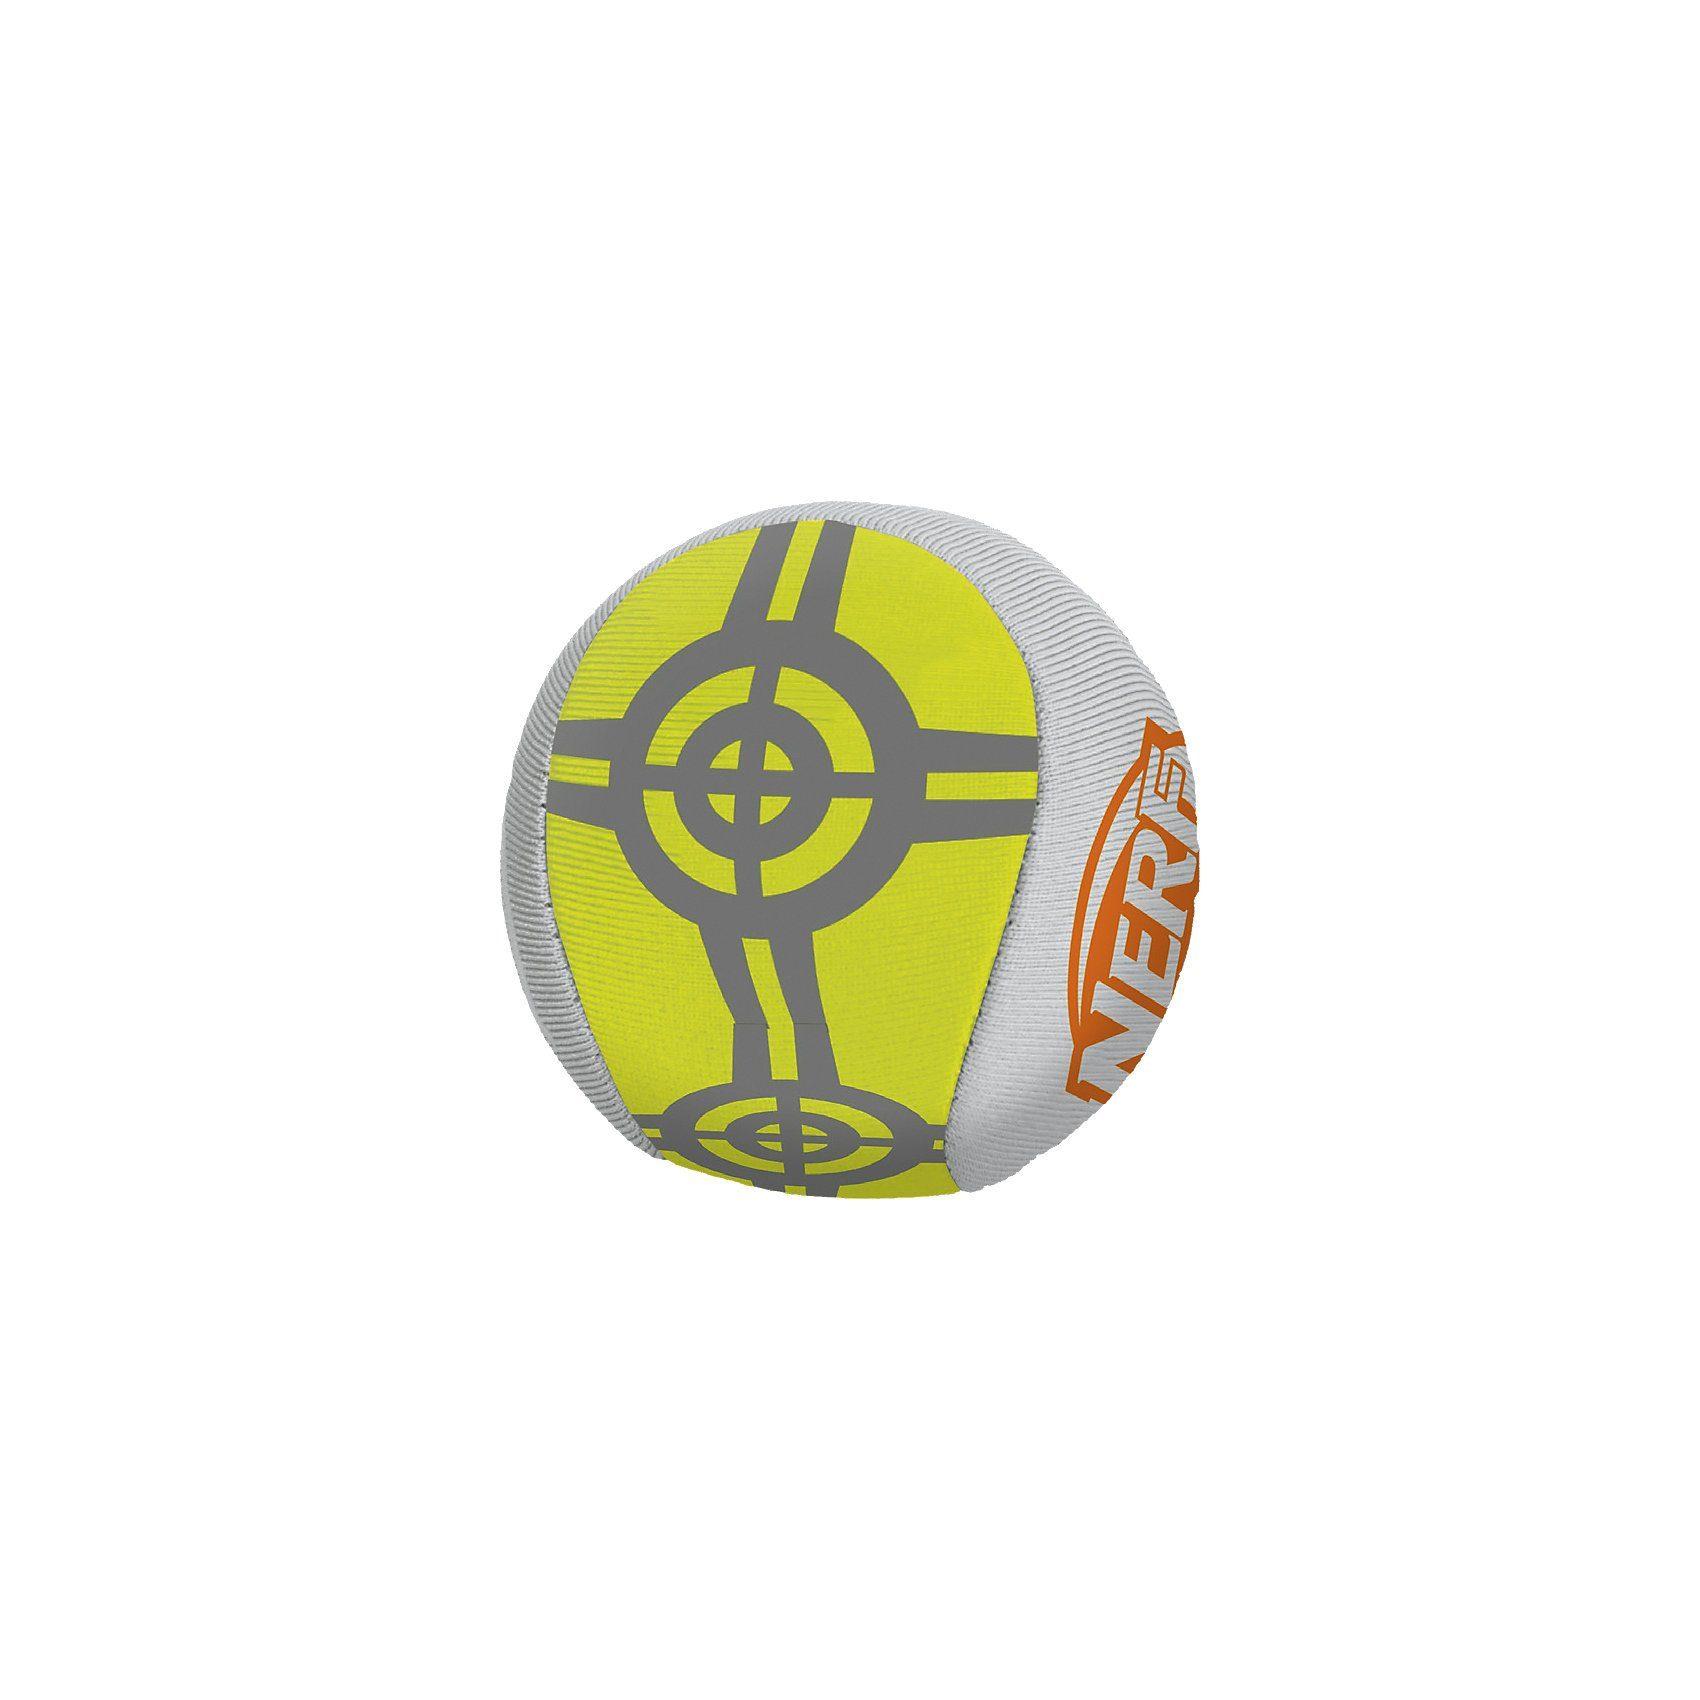 Happy People NERF Neopren Wasserspaßball, Ø 5cm